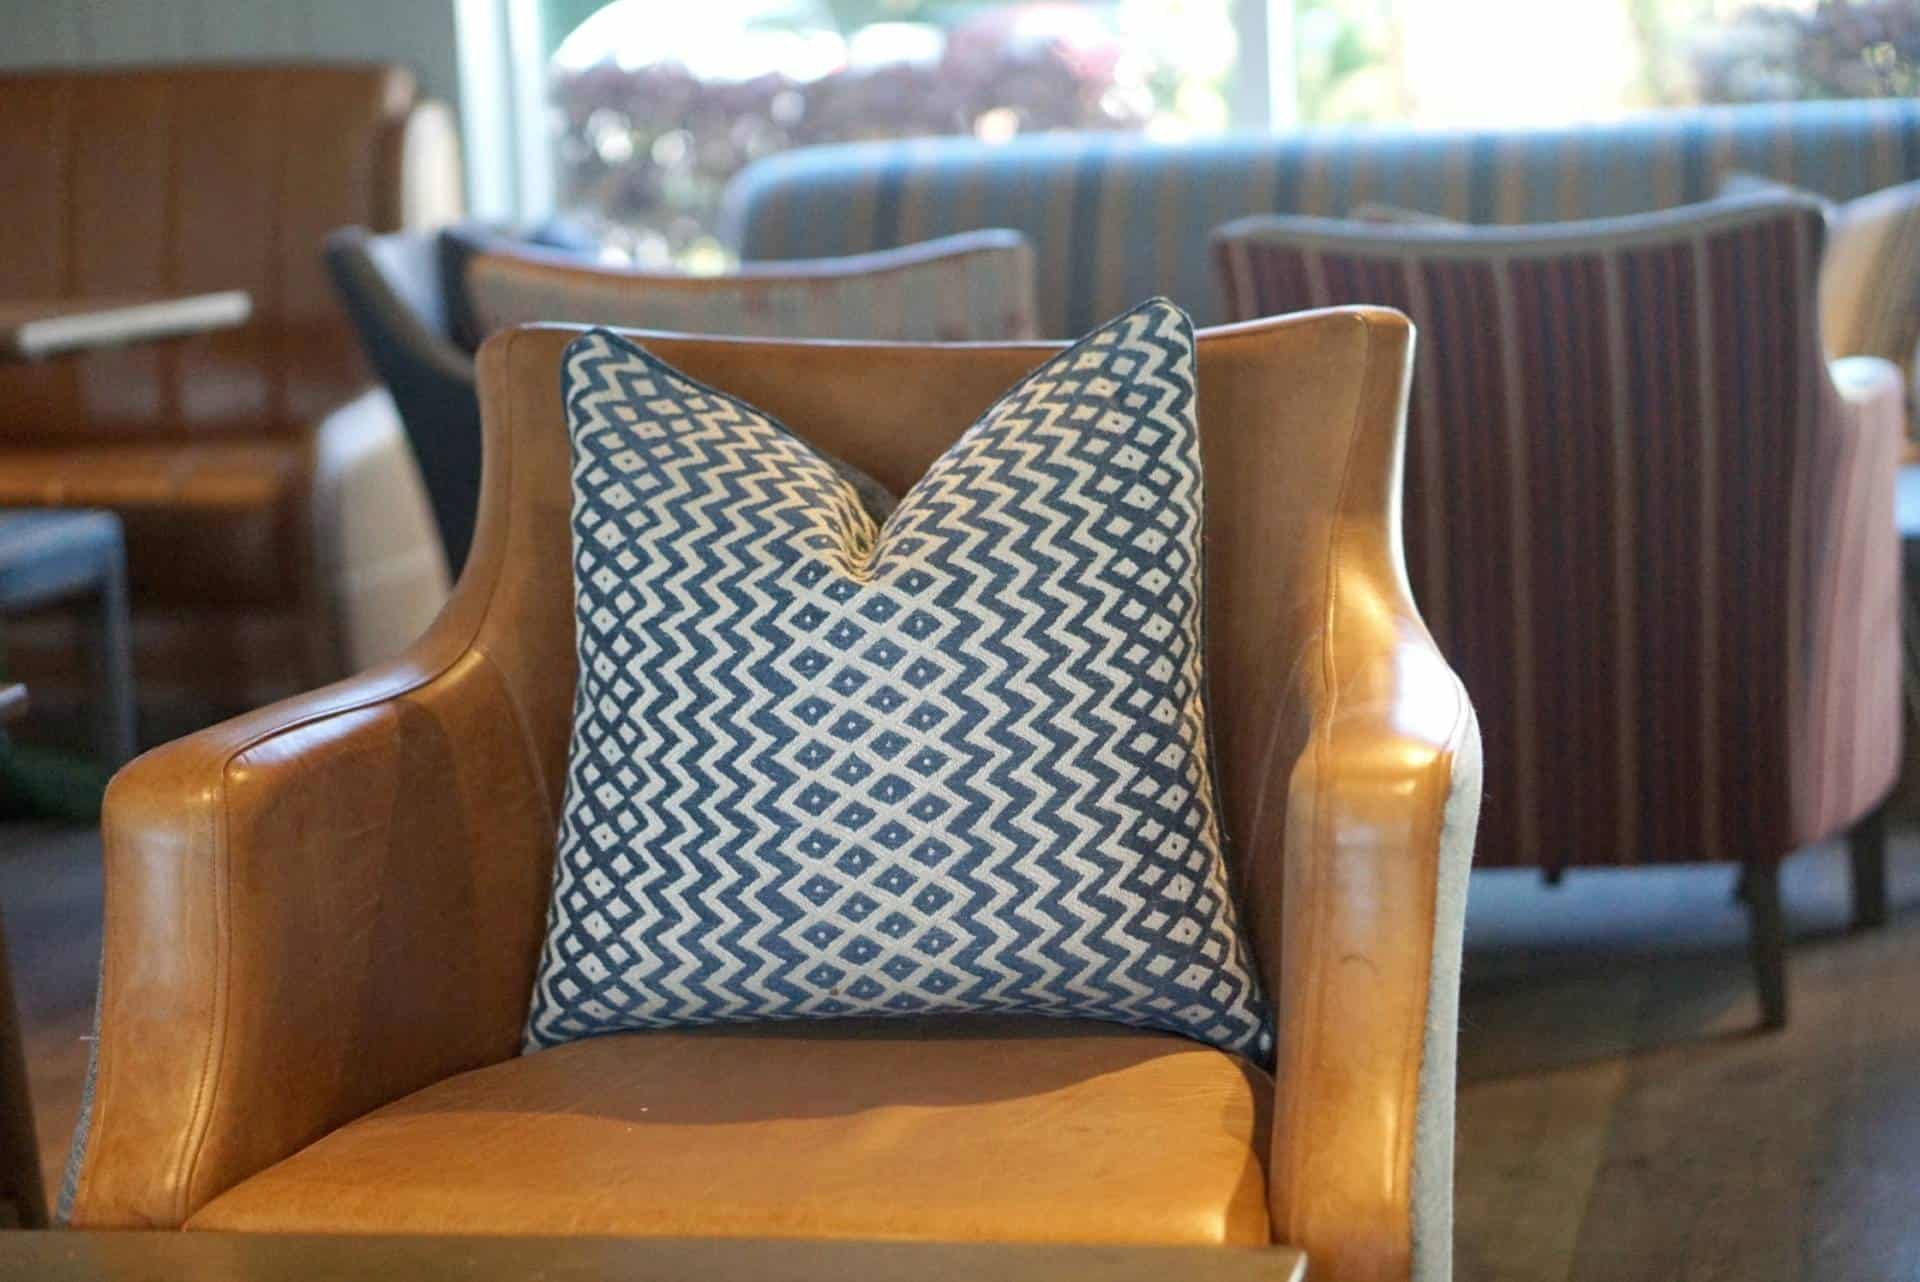 Luxury Lodge Life At Cameron Lodges, Loch Lomond Part 1